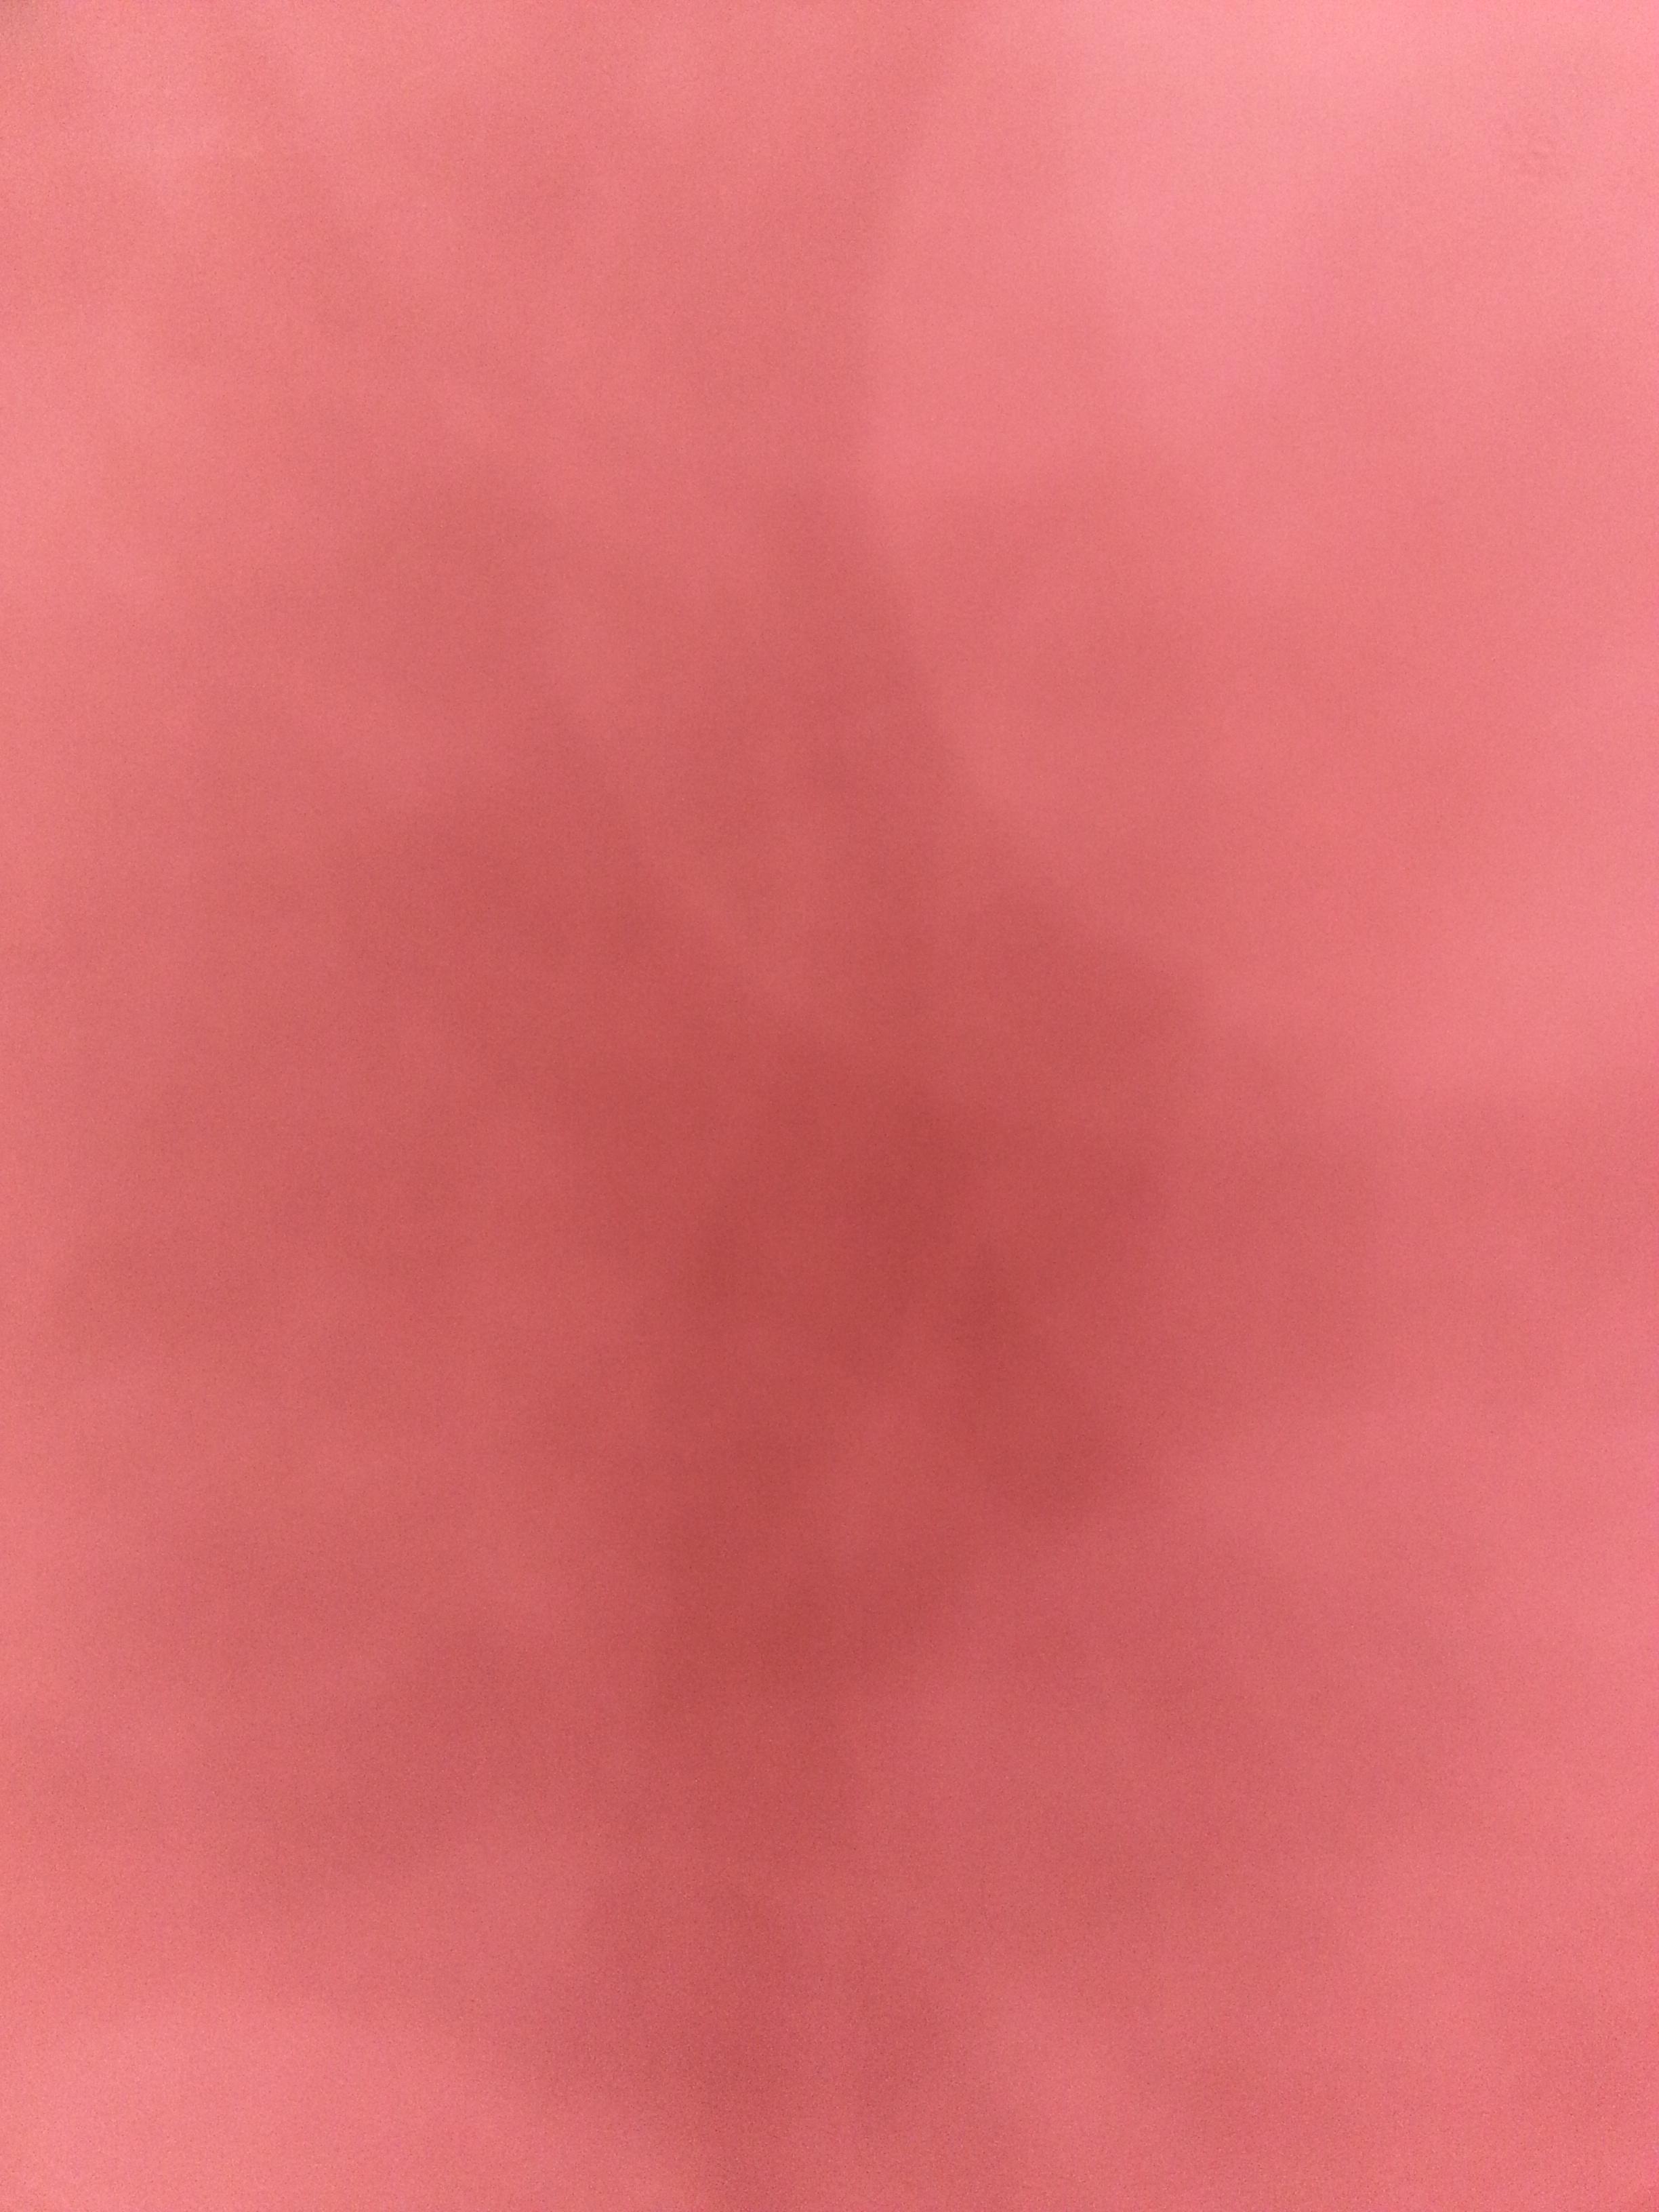 2014-02-05 19.25.51